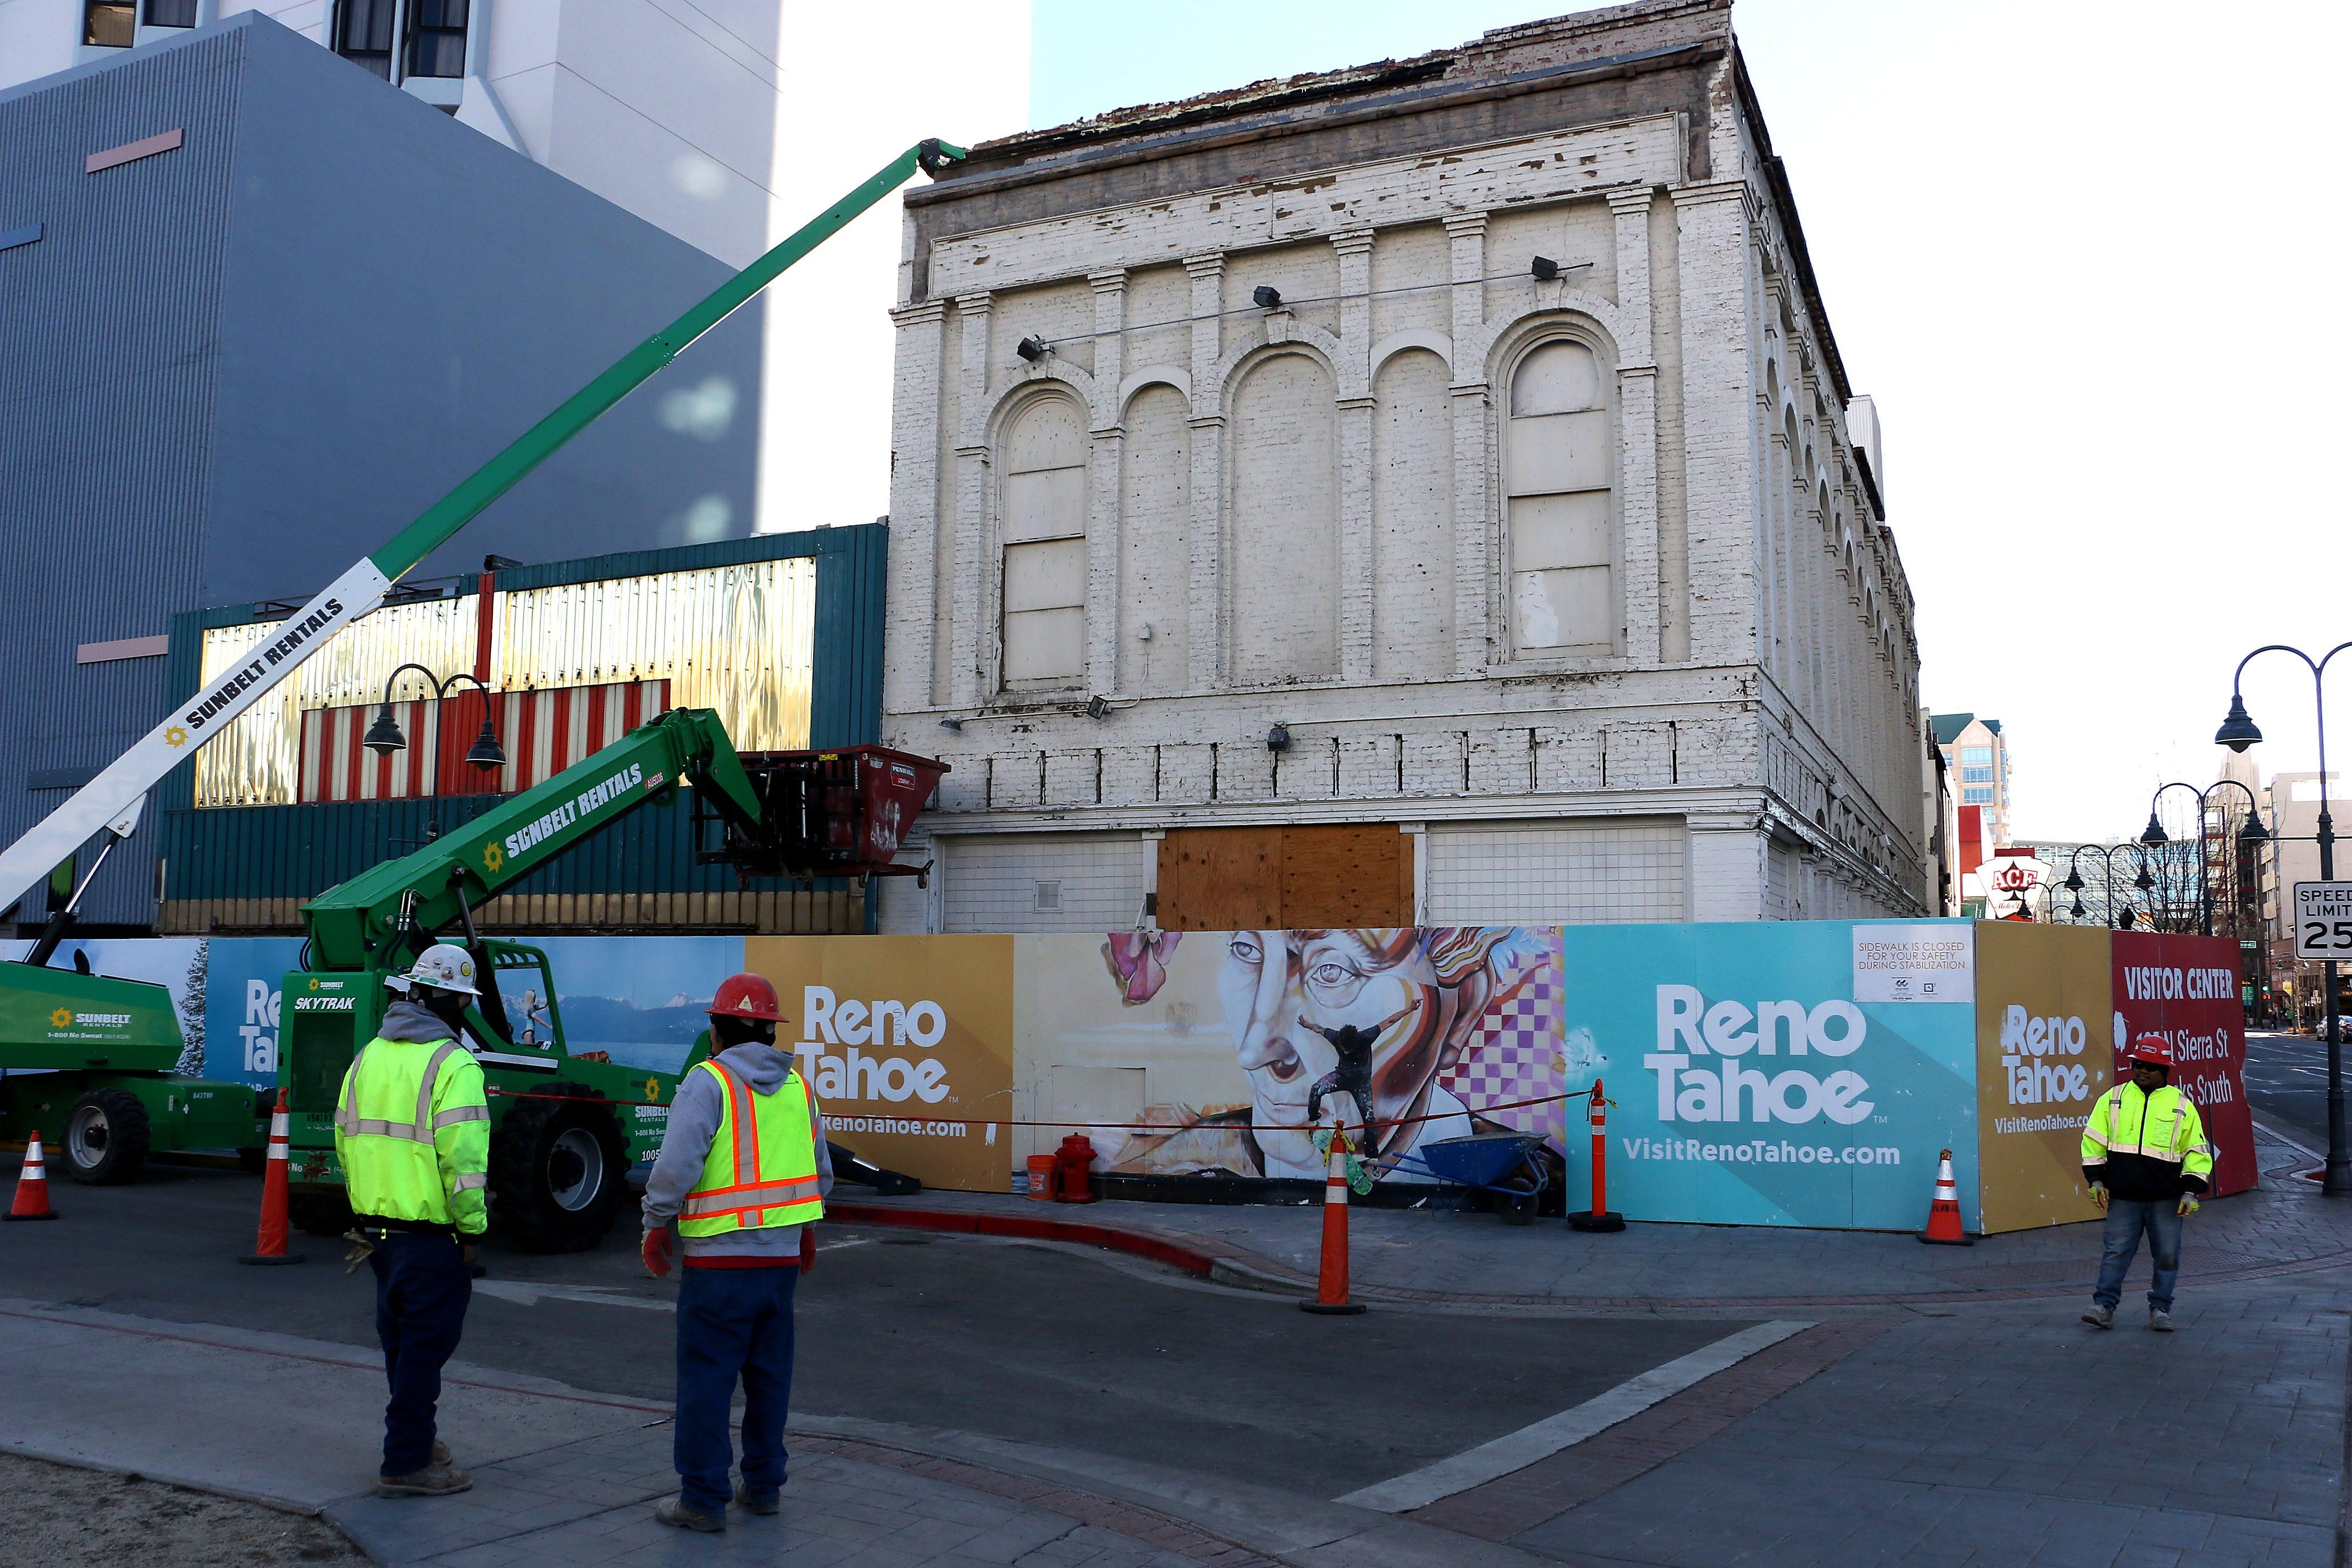 Box of cremated remains found at Reno tattoo shop